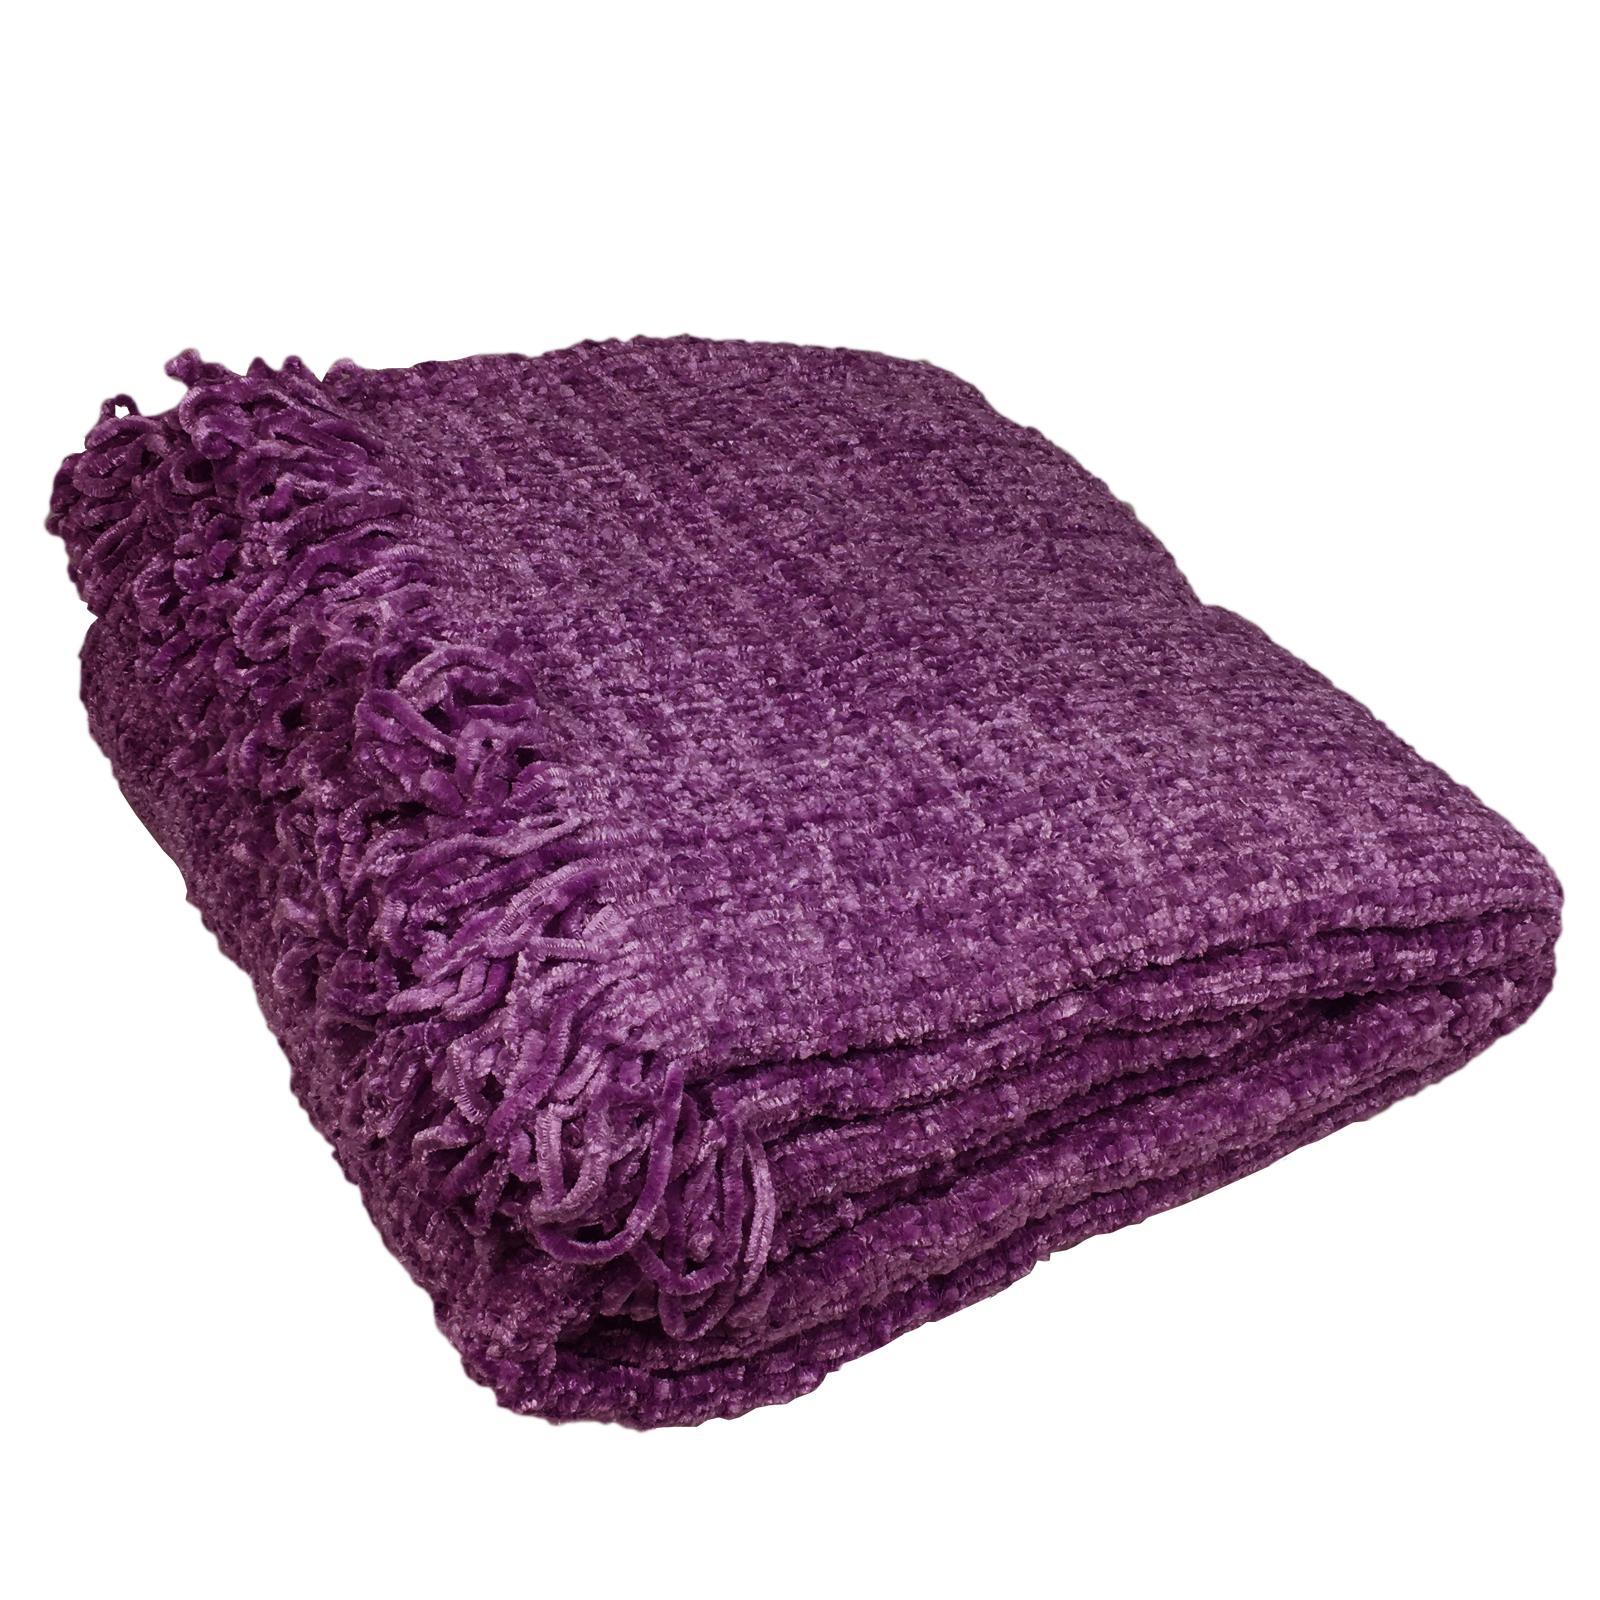 luxury chenille throw  large warm thermal woven throw over  sofa  - luxurychenillethrowlargewarmthermalwoventhrow